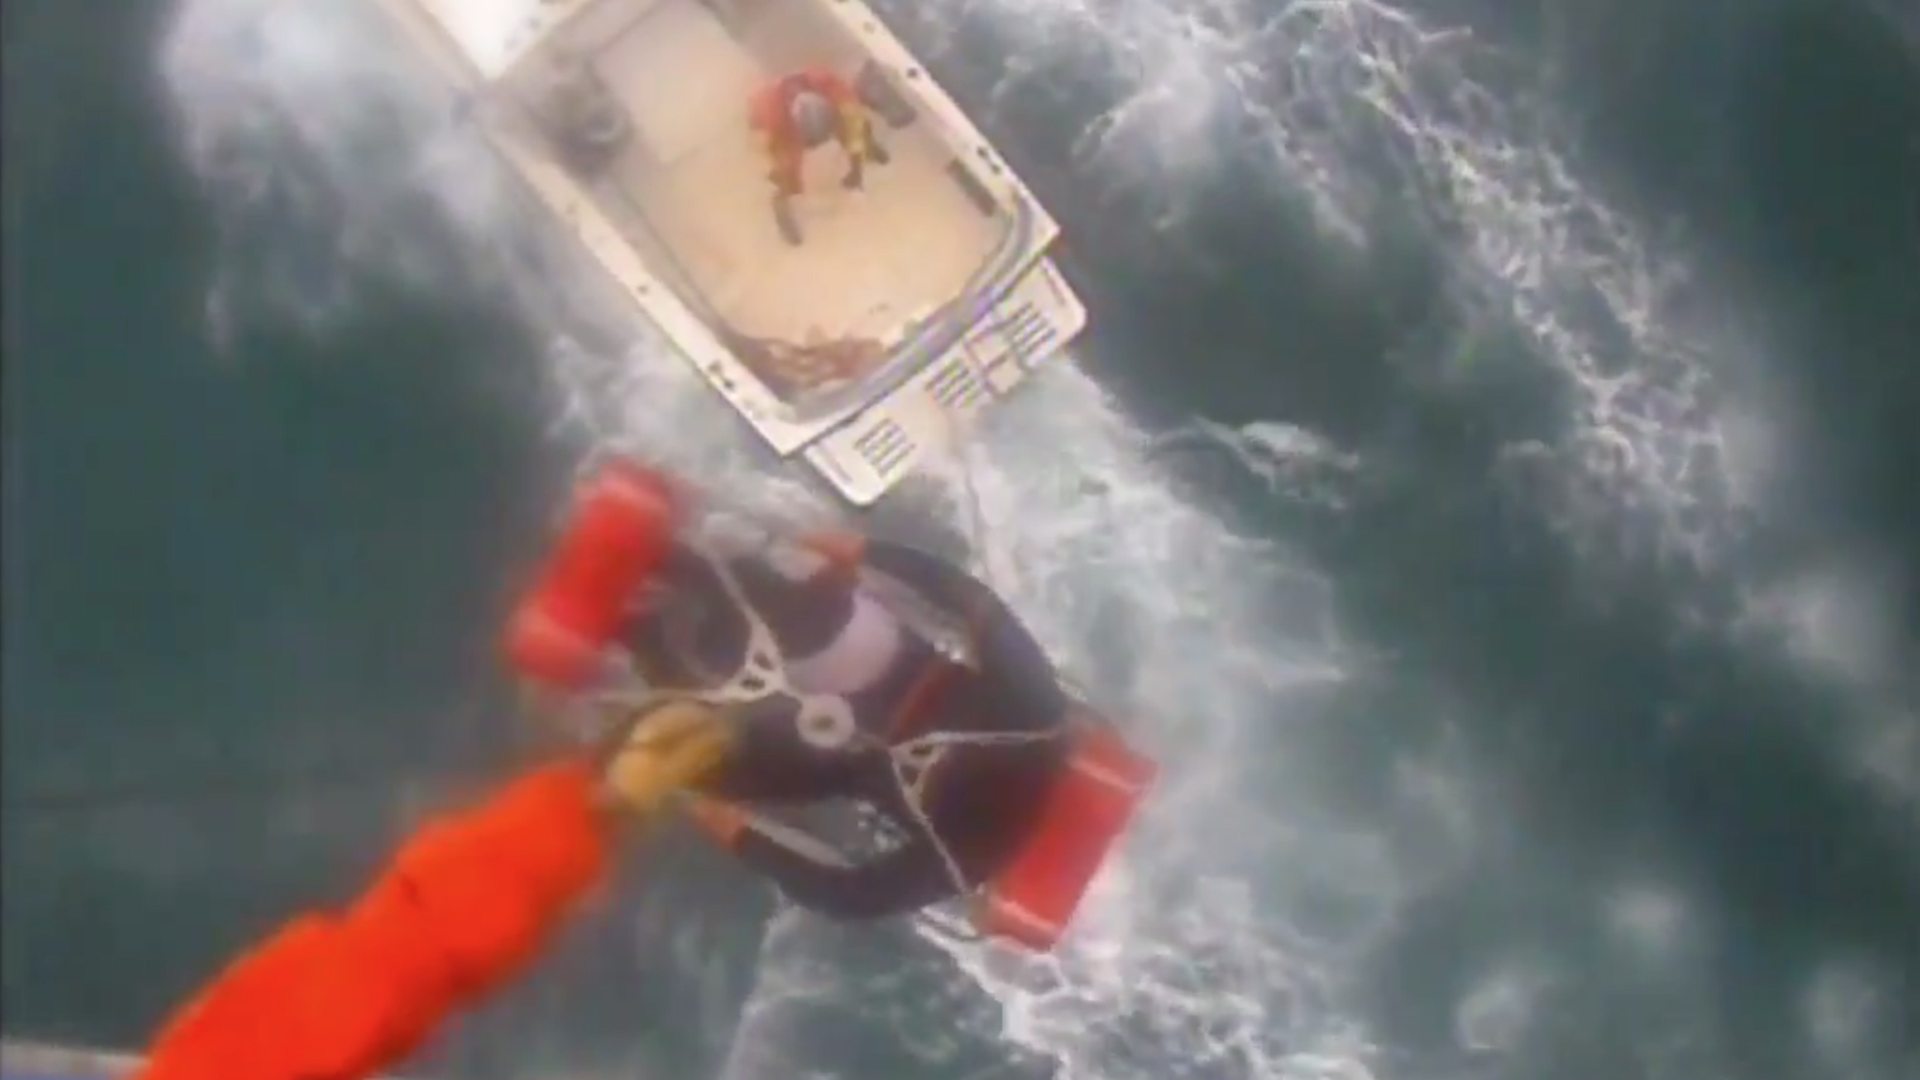 A U.S. Coast Guard crew hoists a shark bite victim into a helicopter near Santa Rosa Island on Dec. 21, 2019. (Credit: USCG)